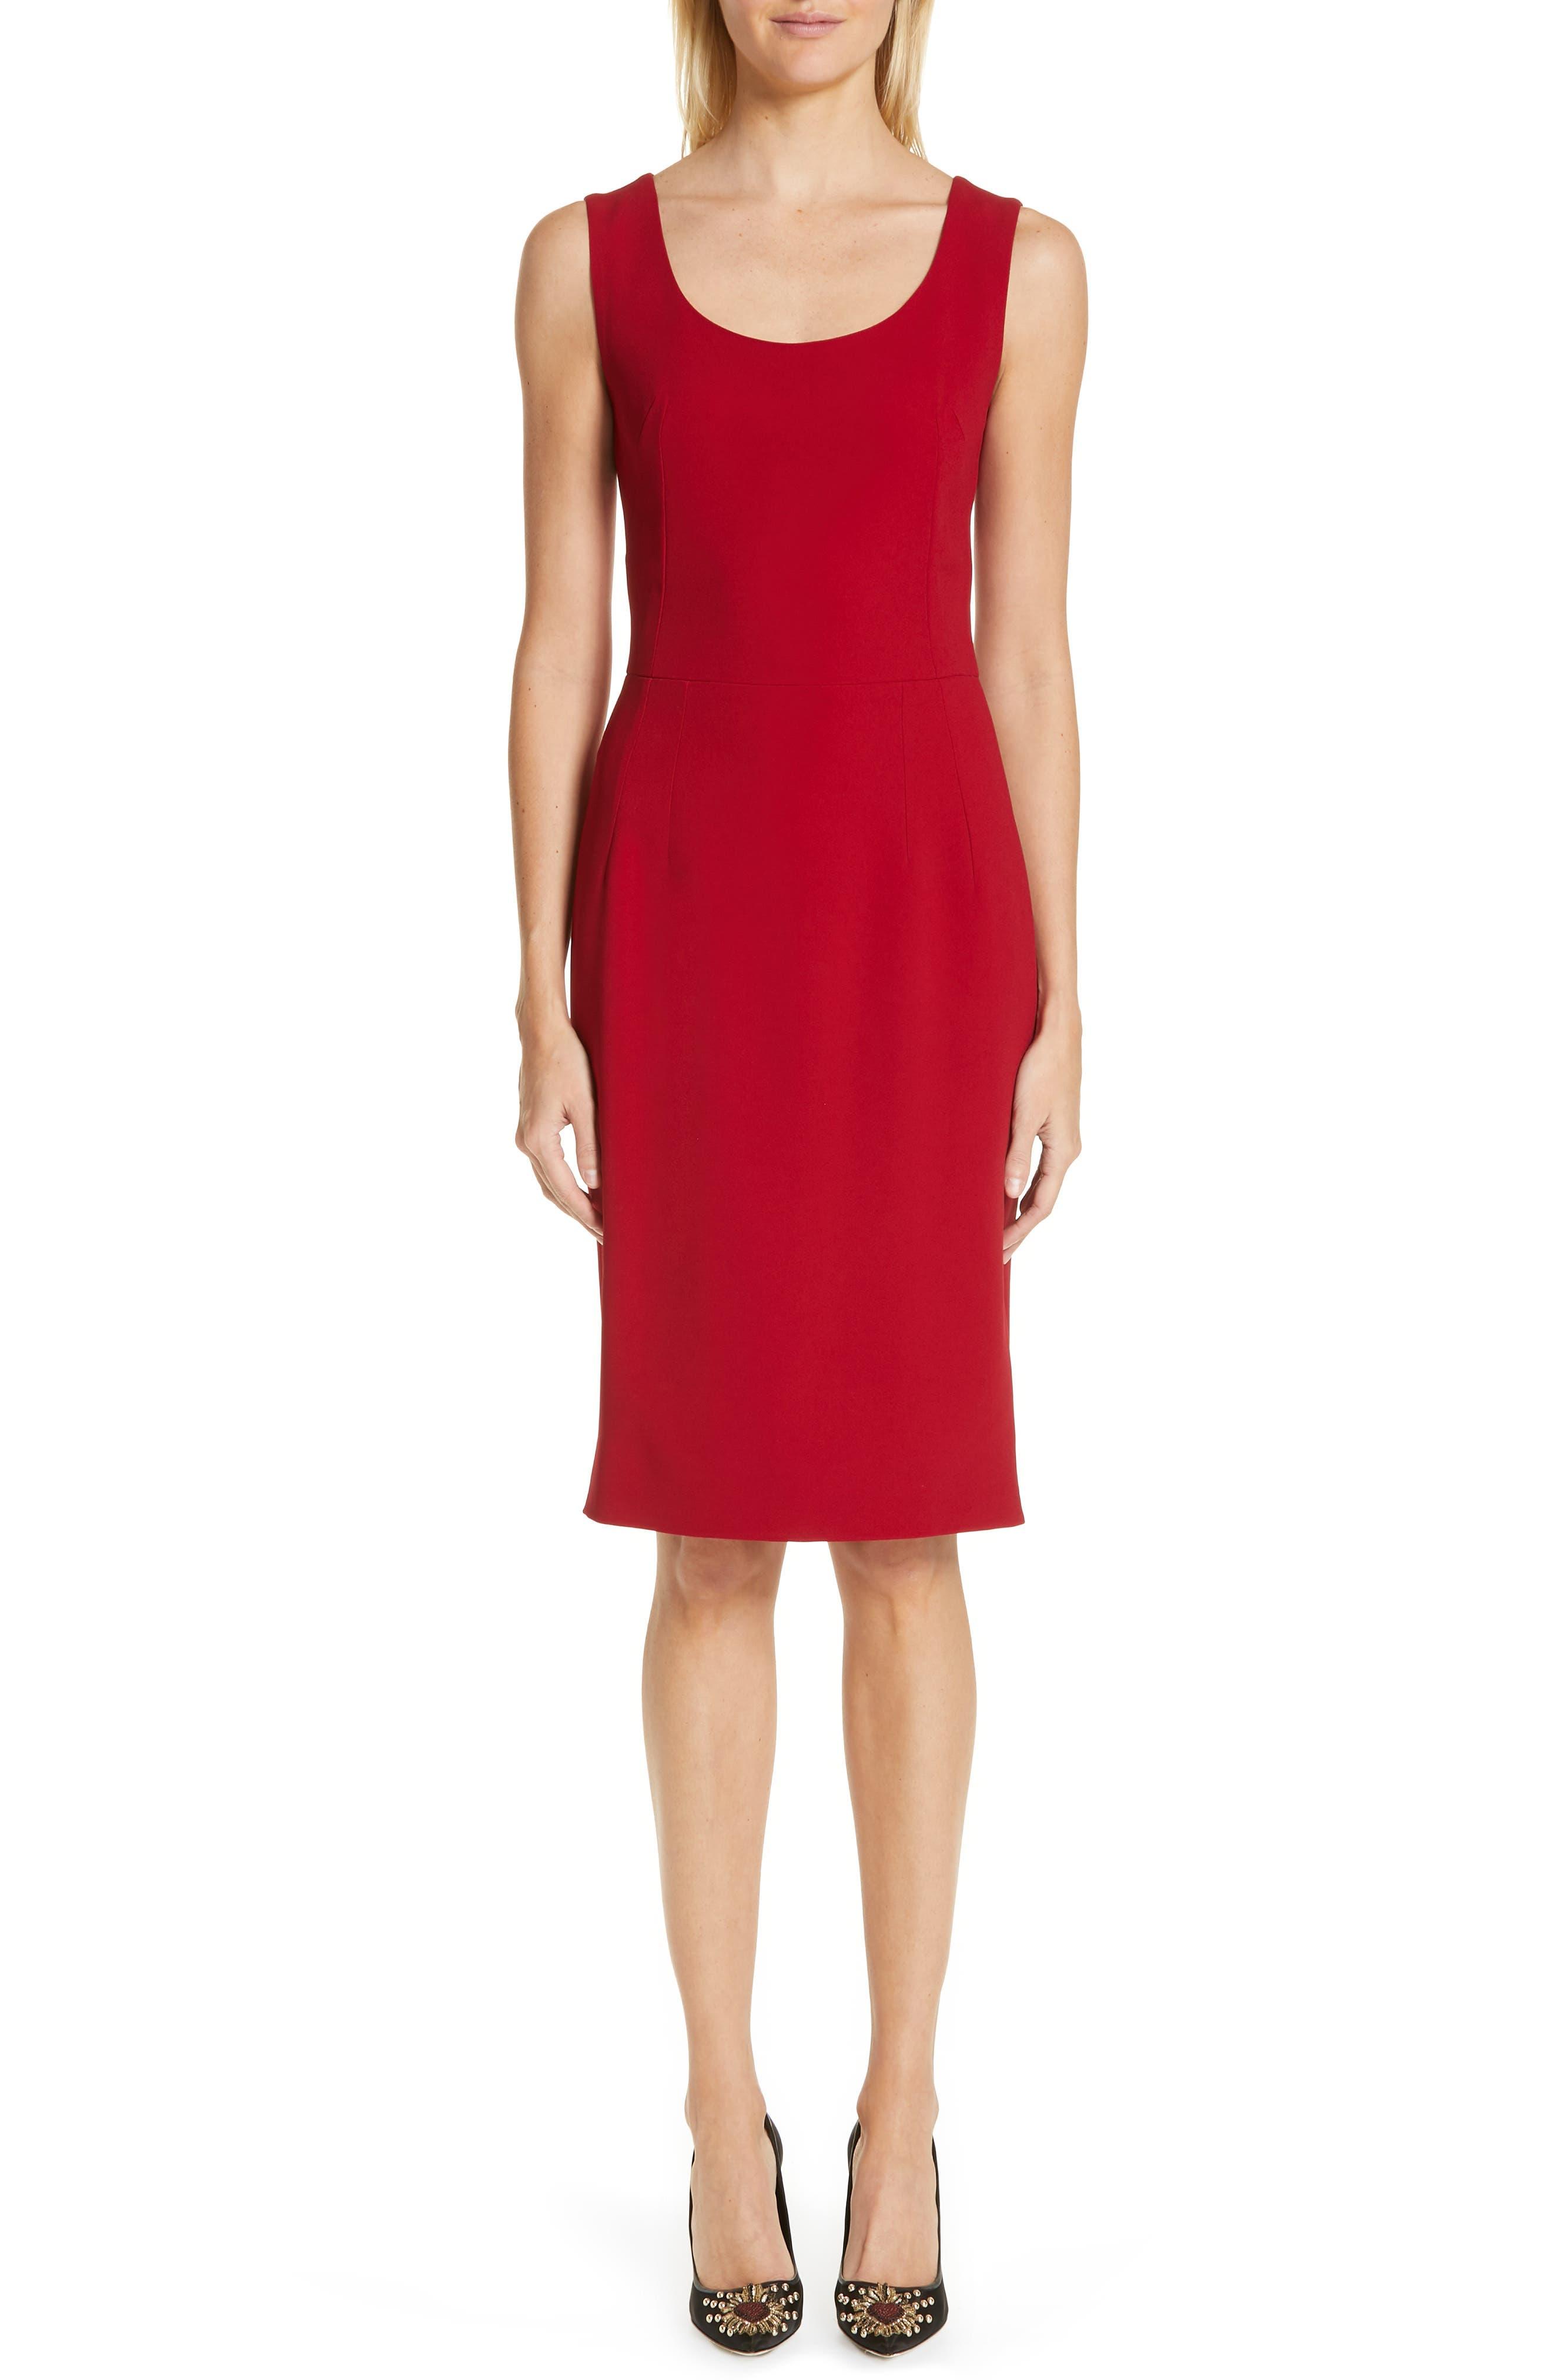 Dolce & gabbana Cady Pencil Dress, US / 46 IT - Burgundy